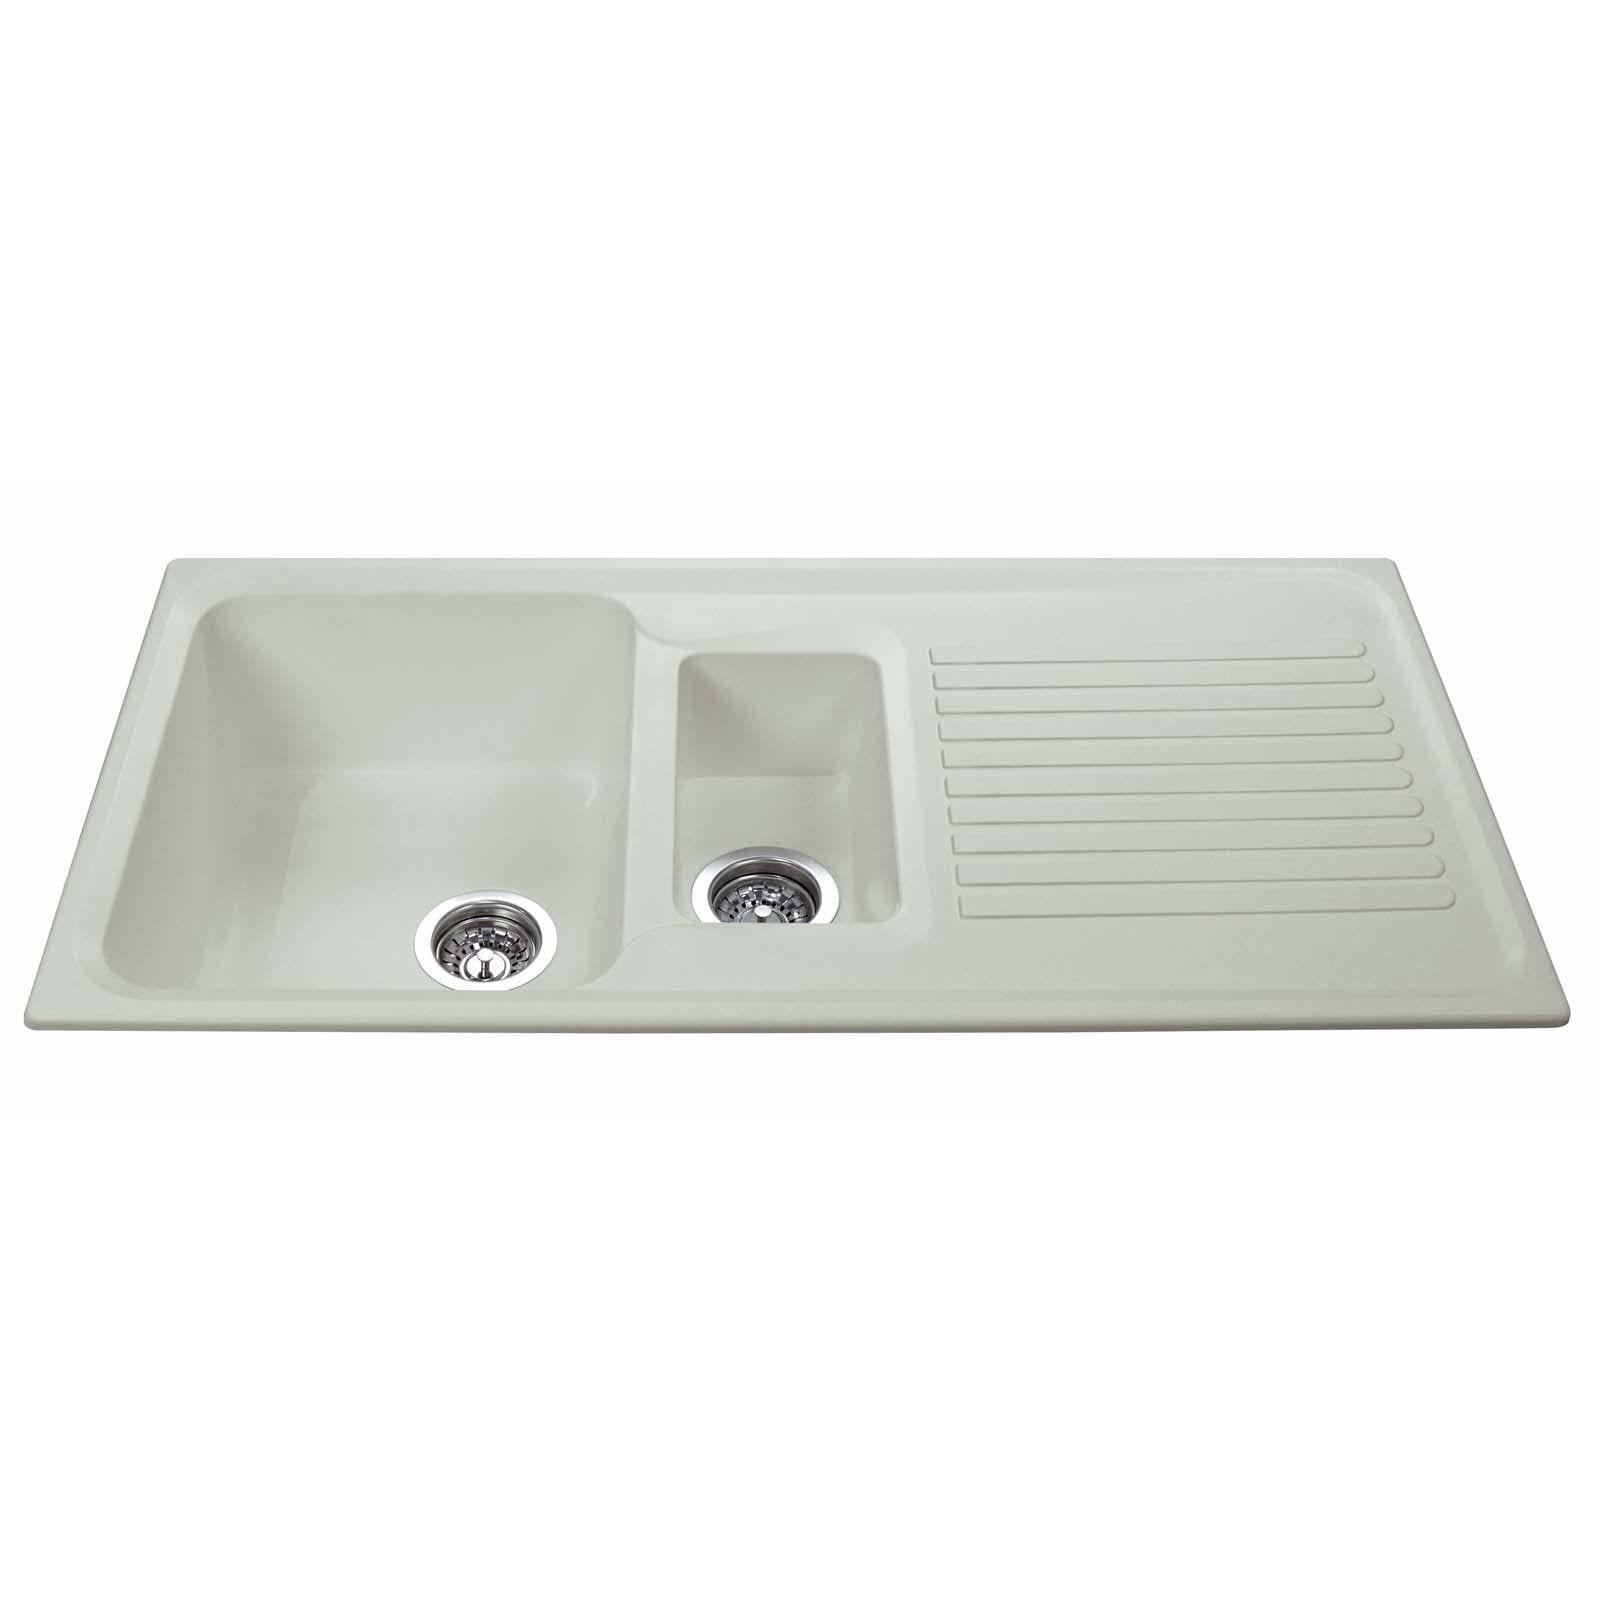 cda as2cm 1 5 bowl cream reversible quartz composite kitchen sink rh shipitappliances com quartz composite kitchen sinks reviews best quartz composite kitchen sinks